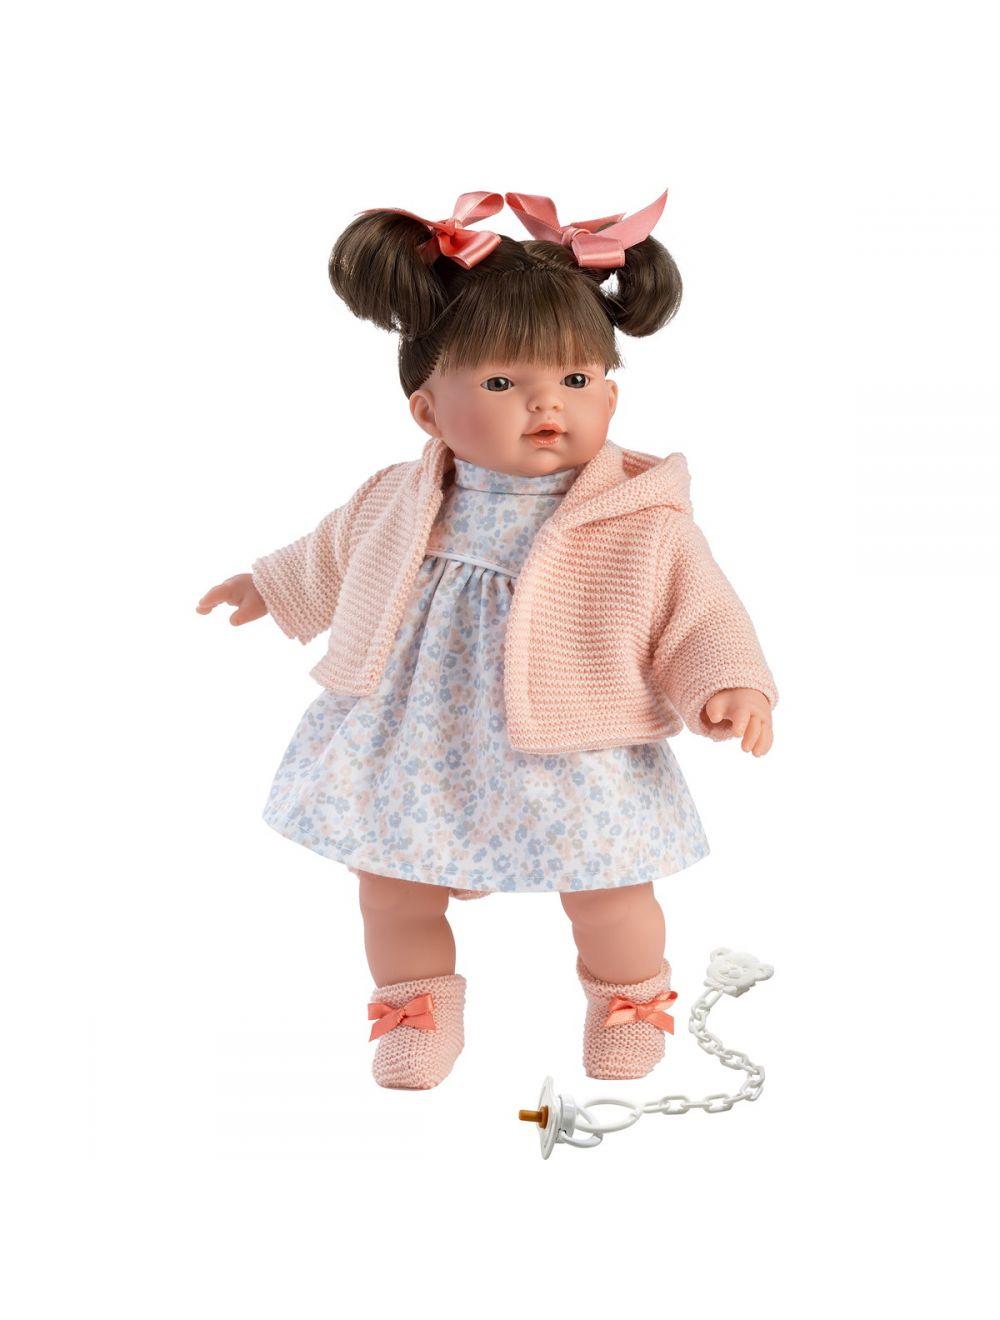 Llorens 33104 Lalka płacząca Rita 33 cm różowa